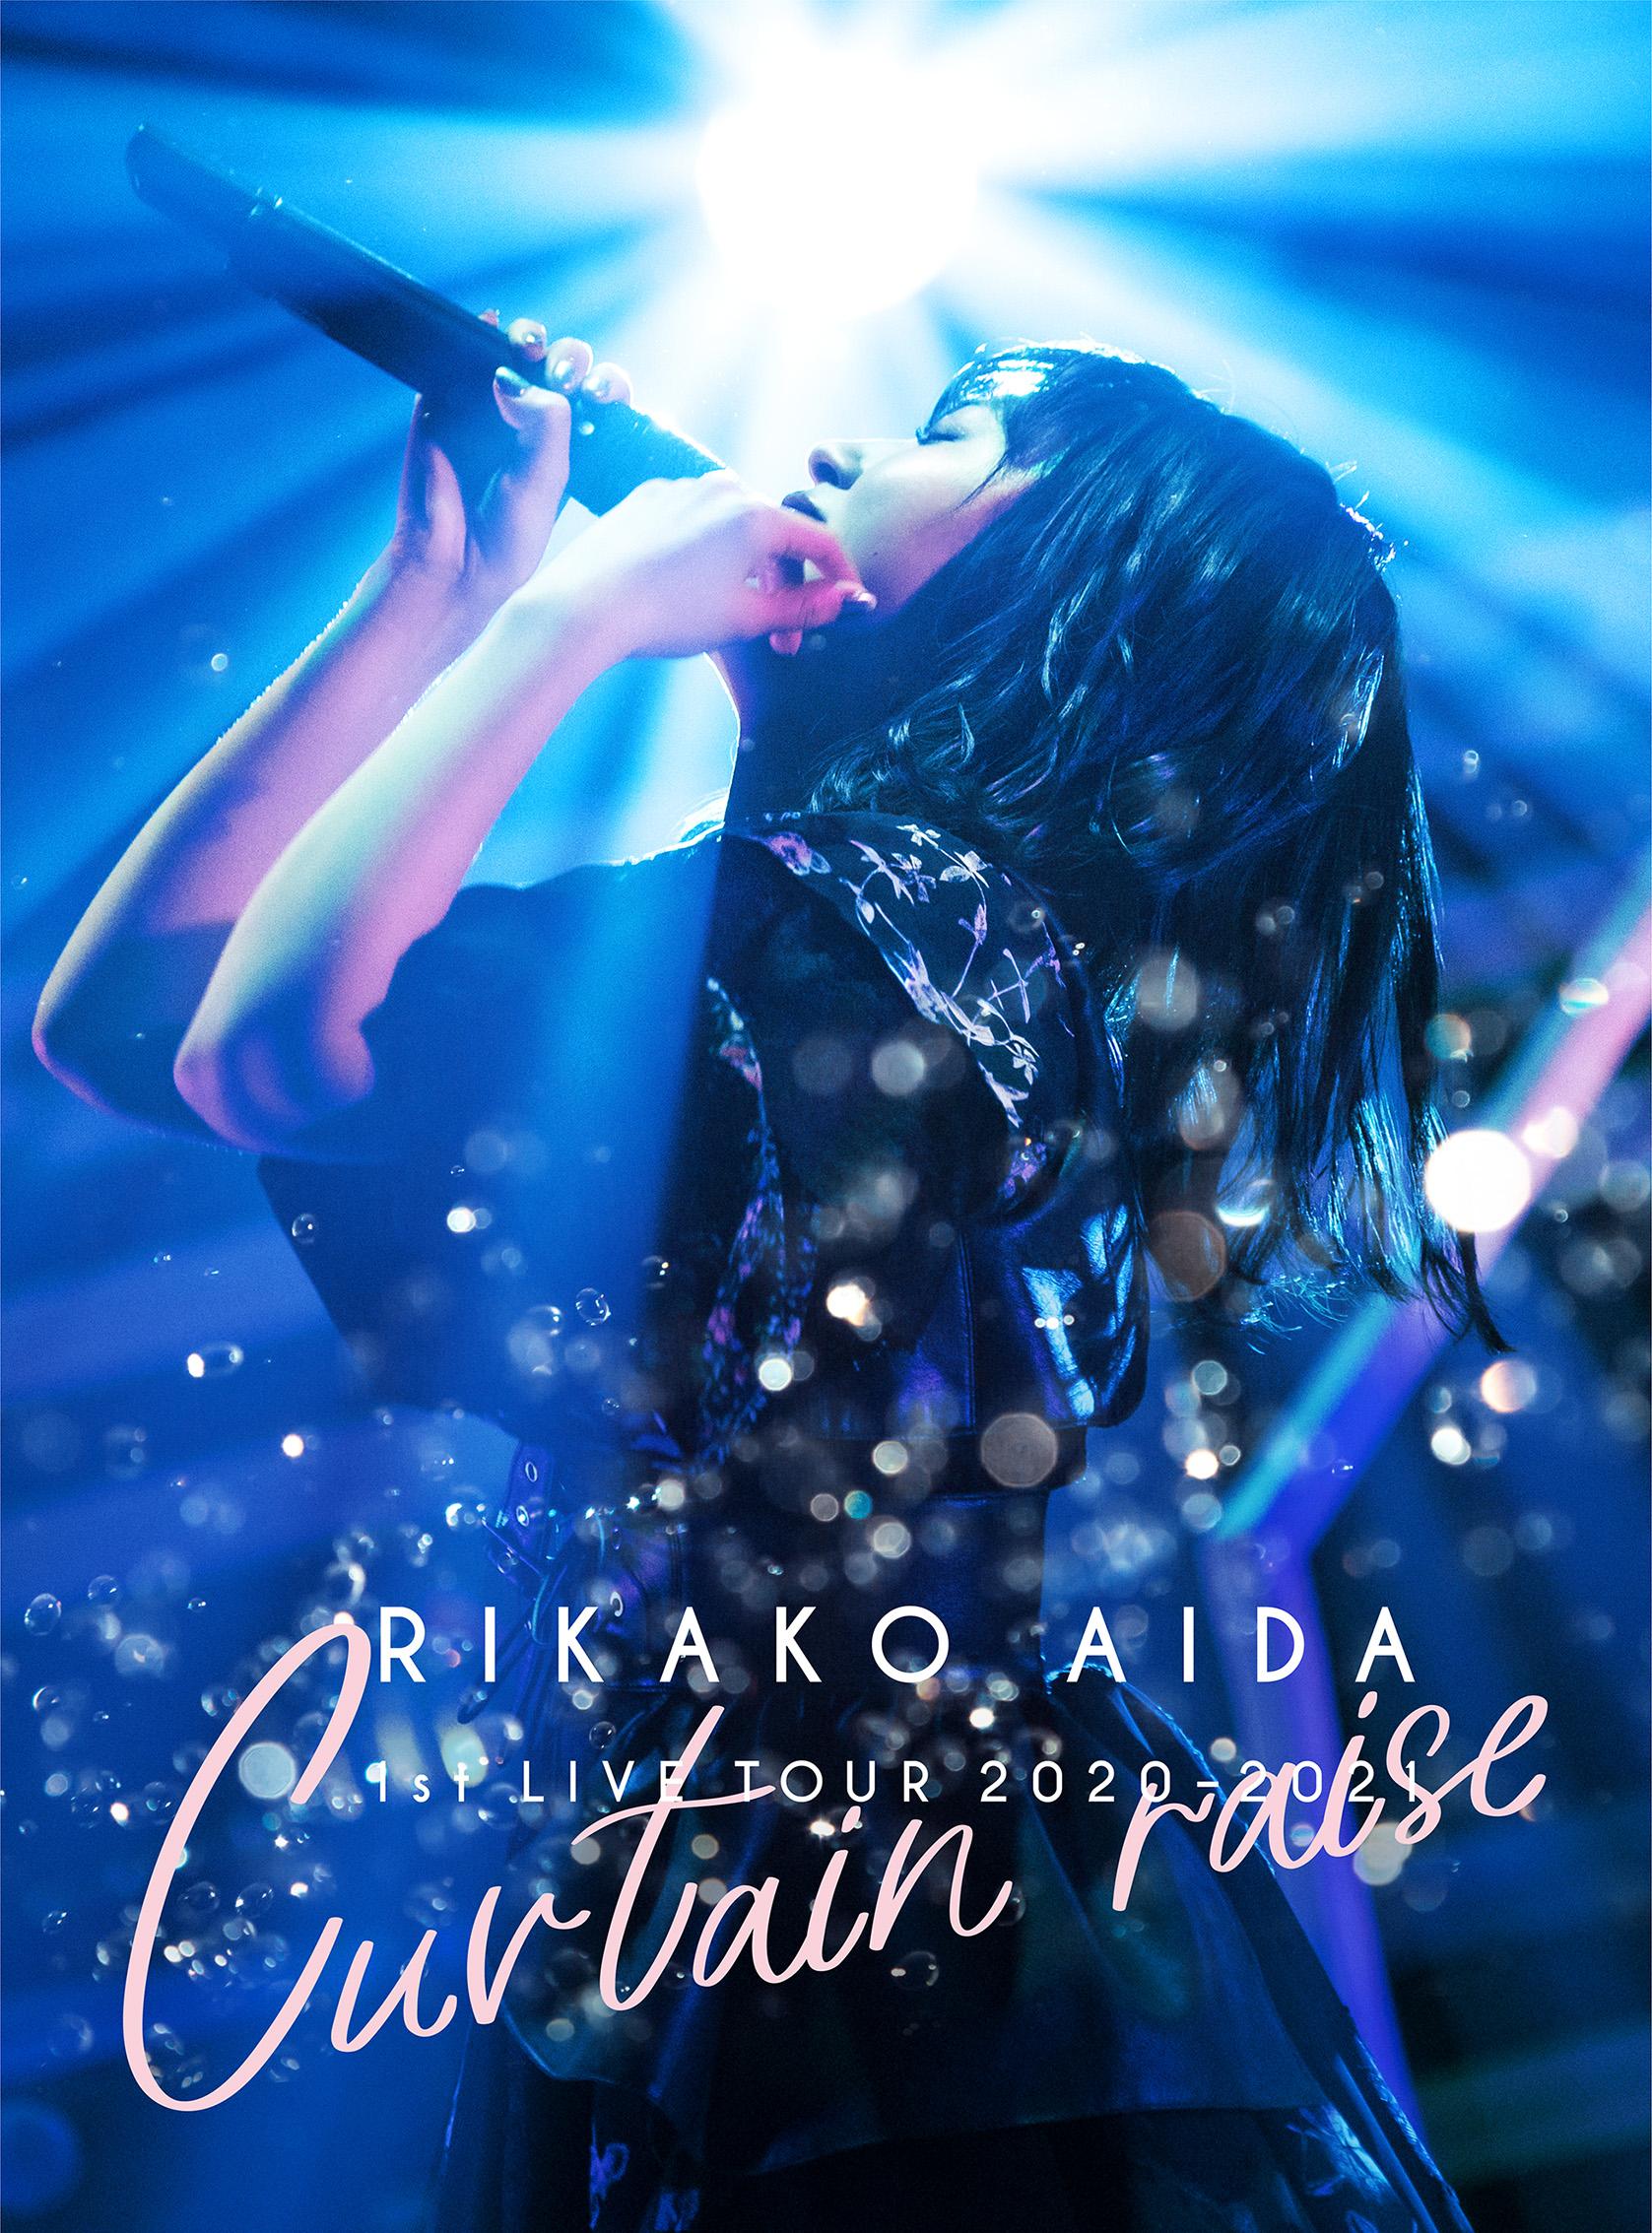 """RIKAKO AIDA 1st LIVE TOUR 2020-2021 「Curtain raise」"""